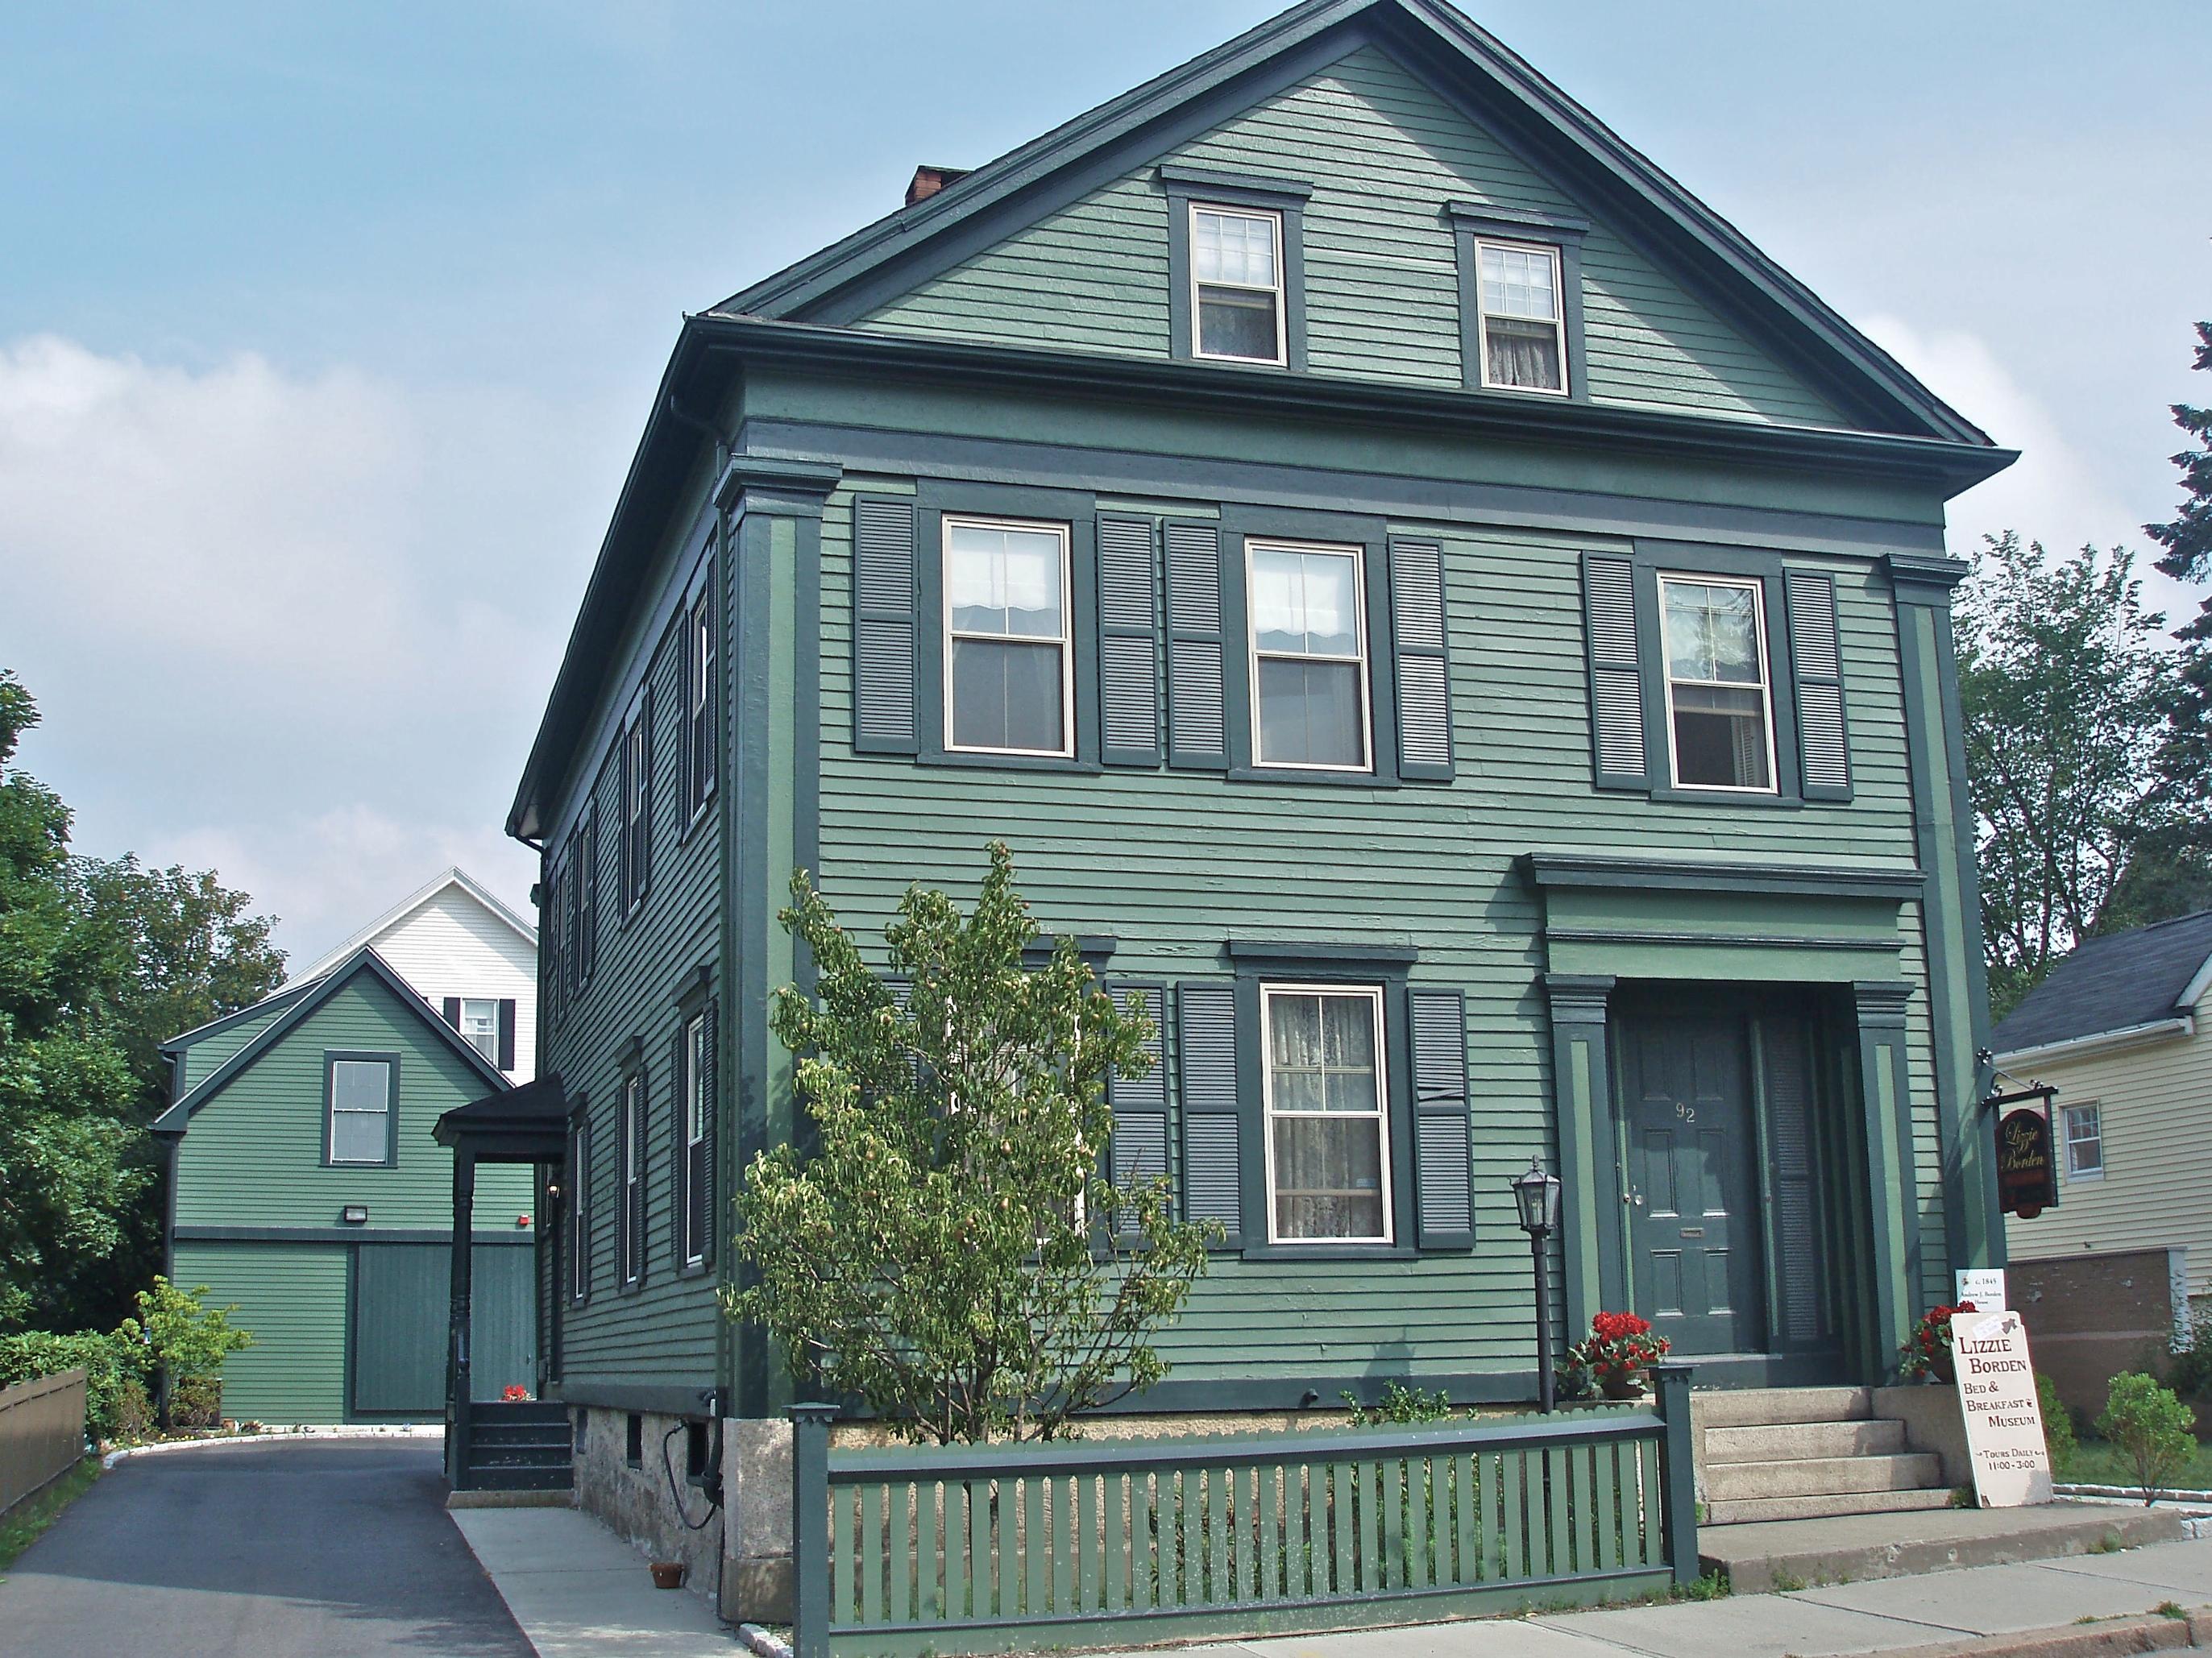 Corky Row Historic District - Wikipedia